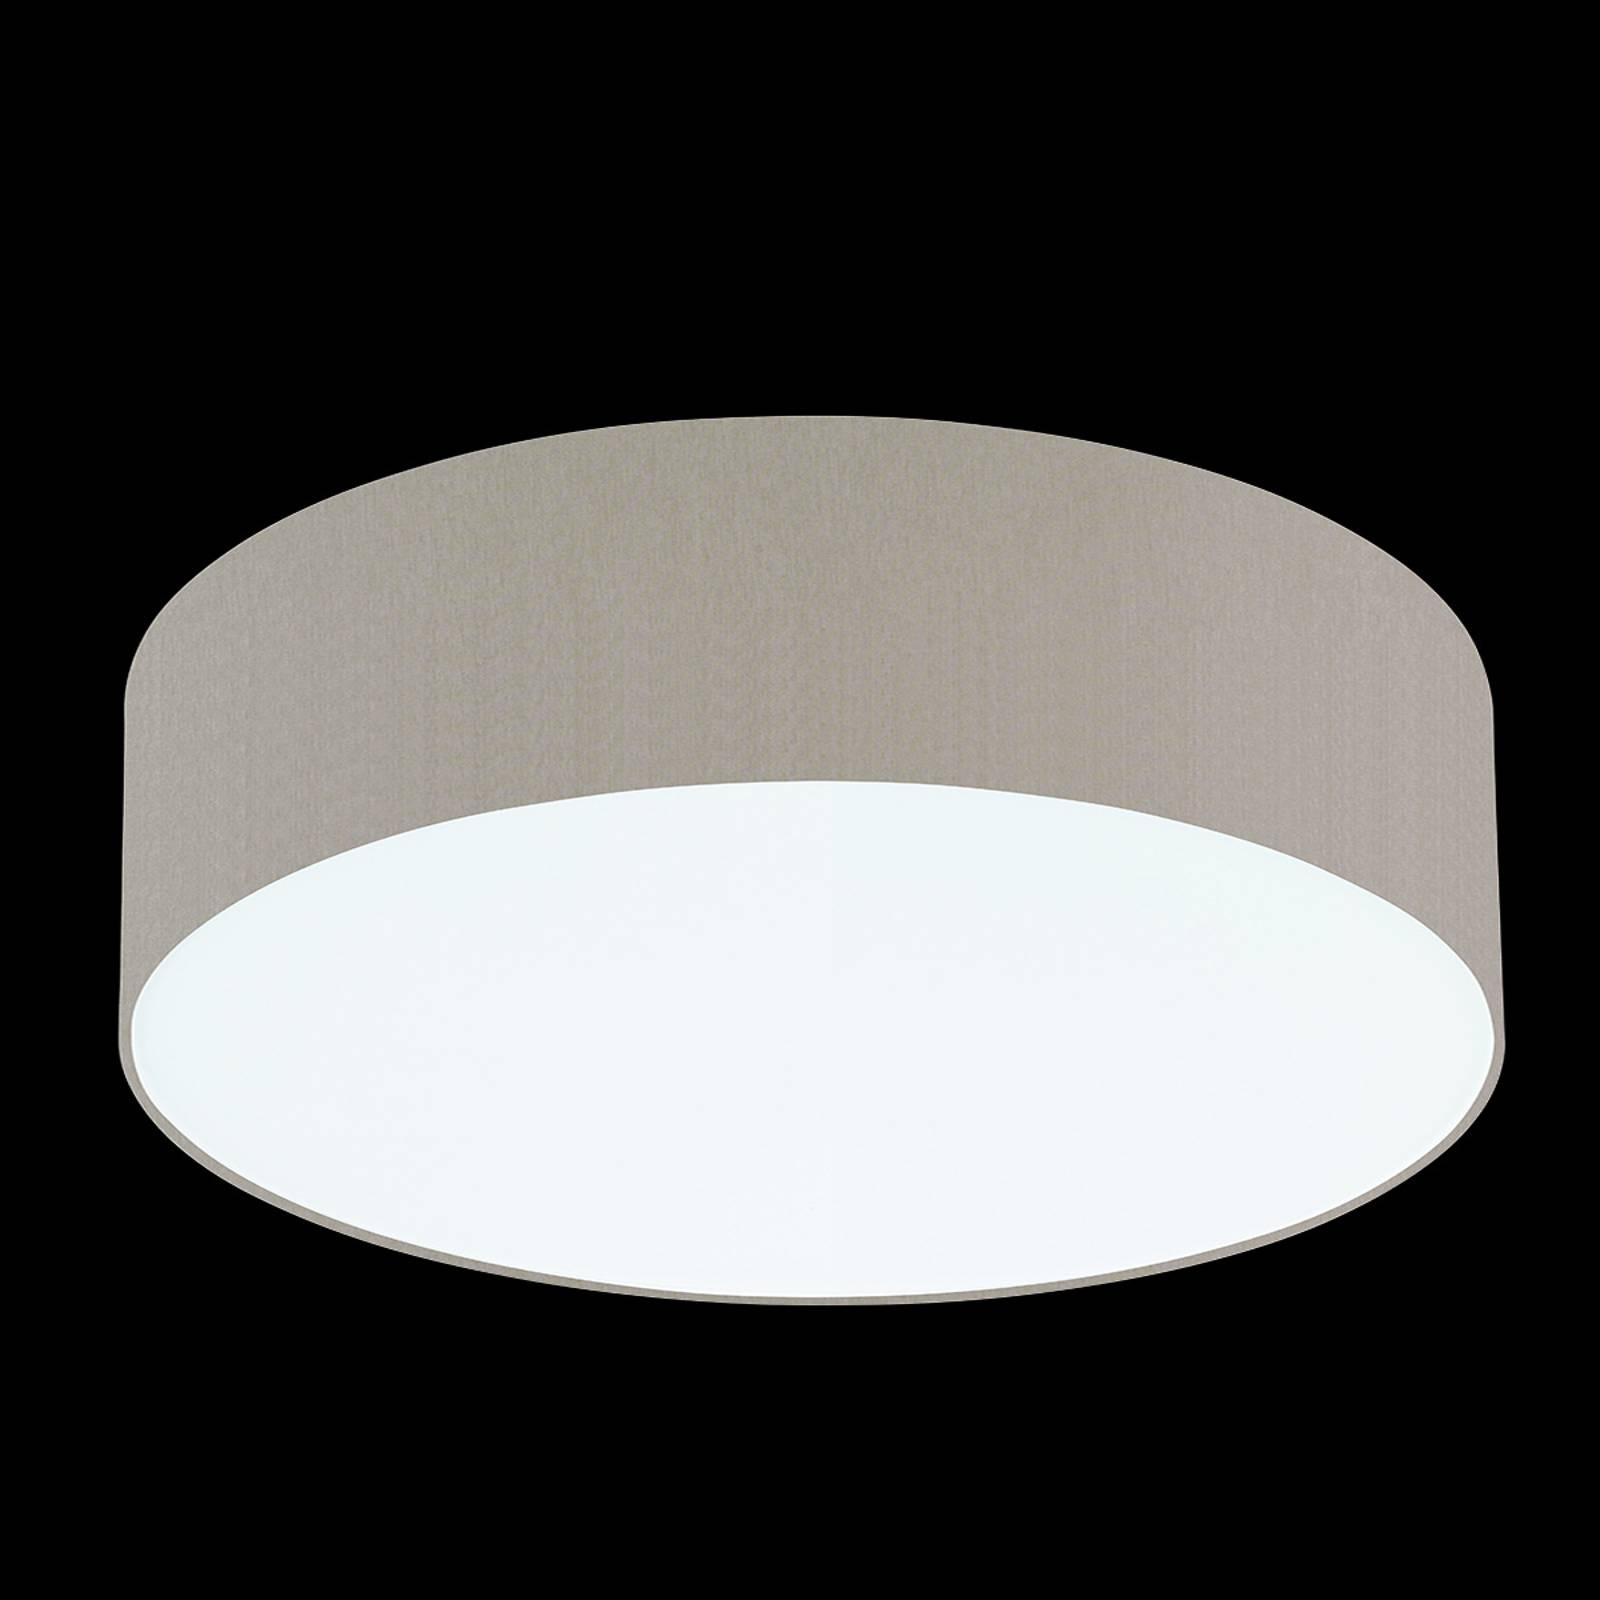 Melangebruine plafondlamp Mara, 60 cm